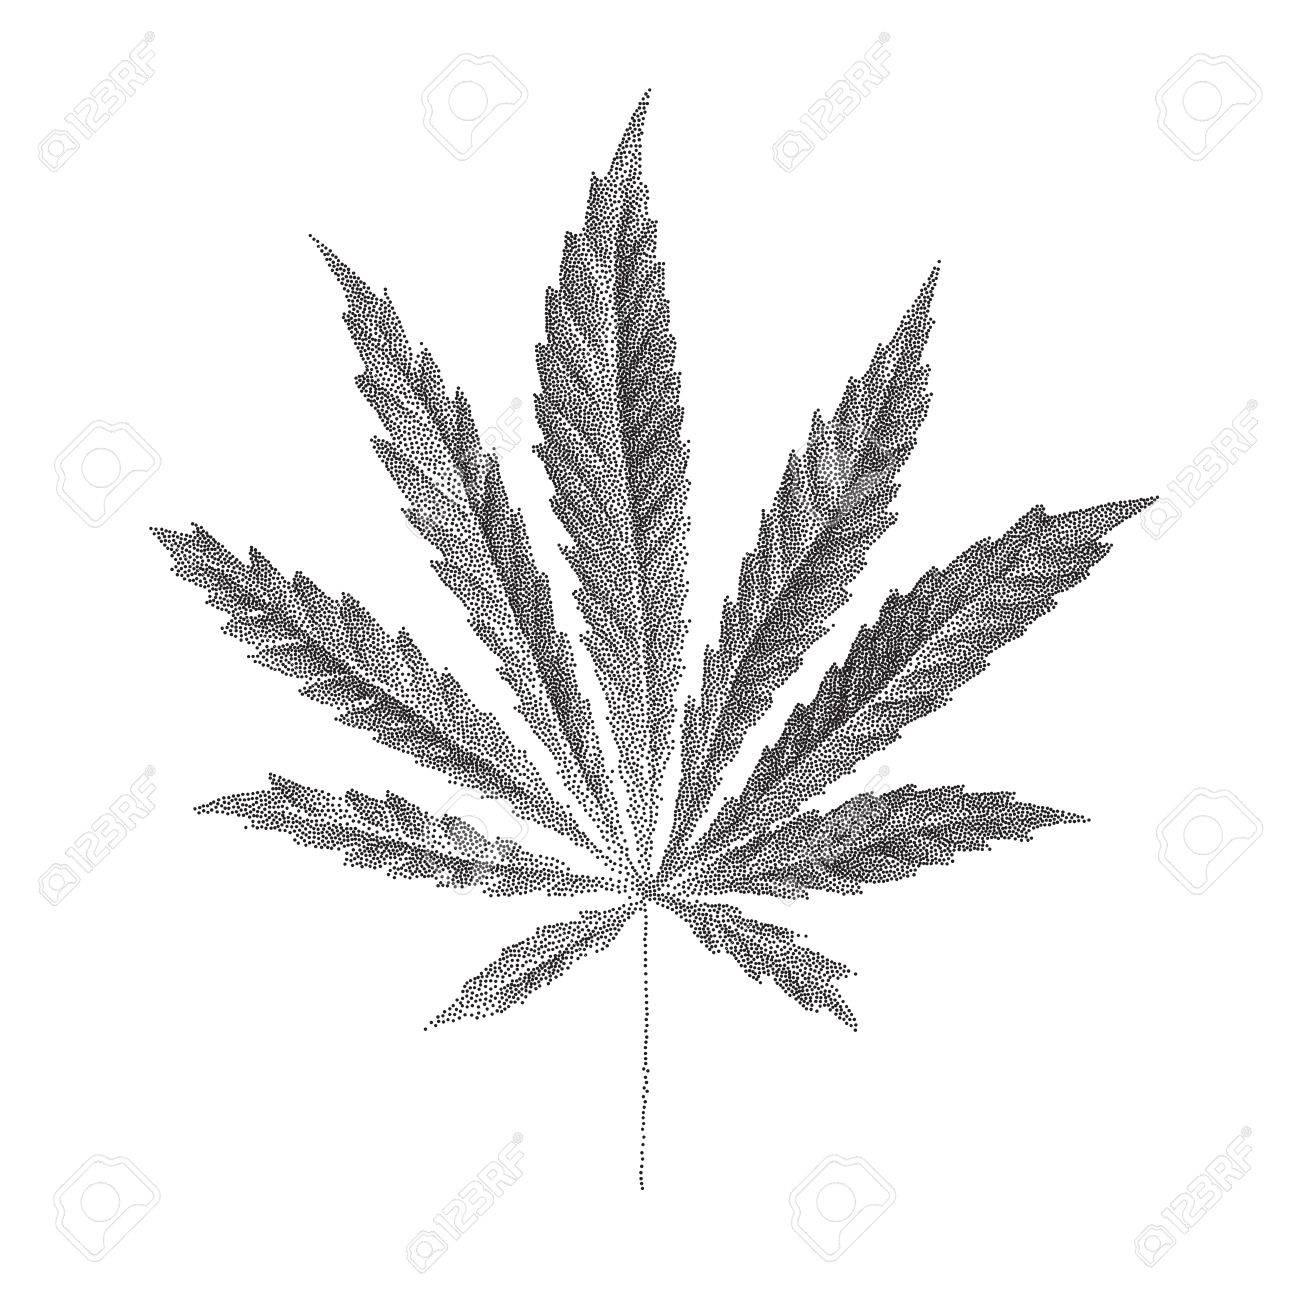 Illustration Vectorielle De La Feuille De Cannabis Sativa Pointillee